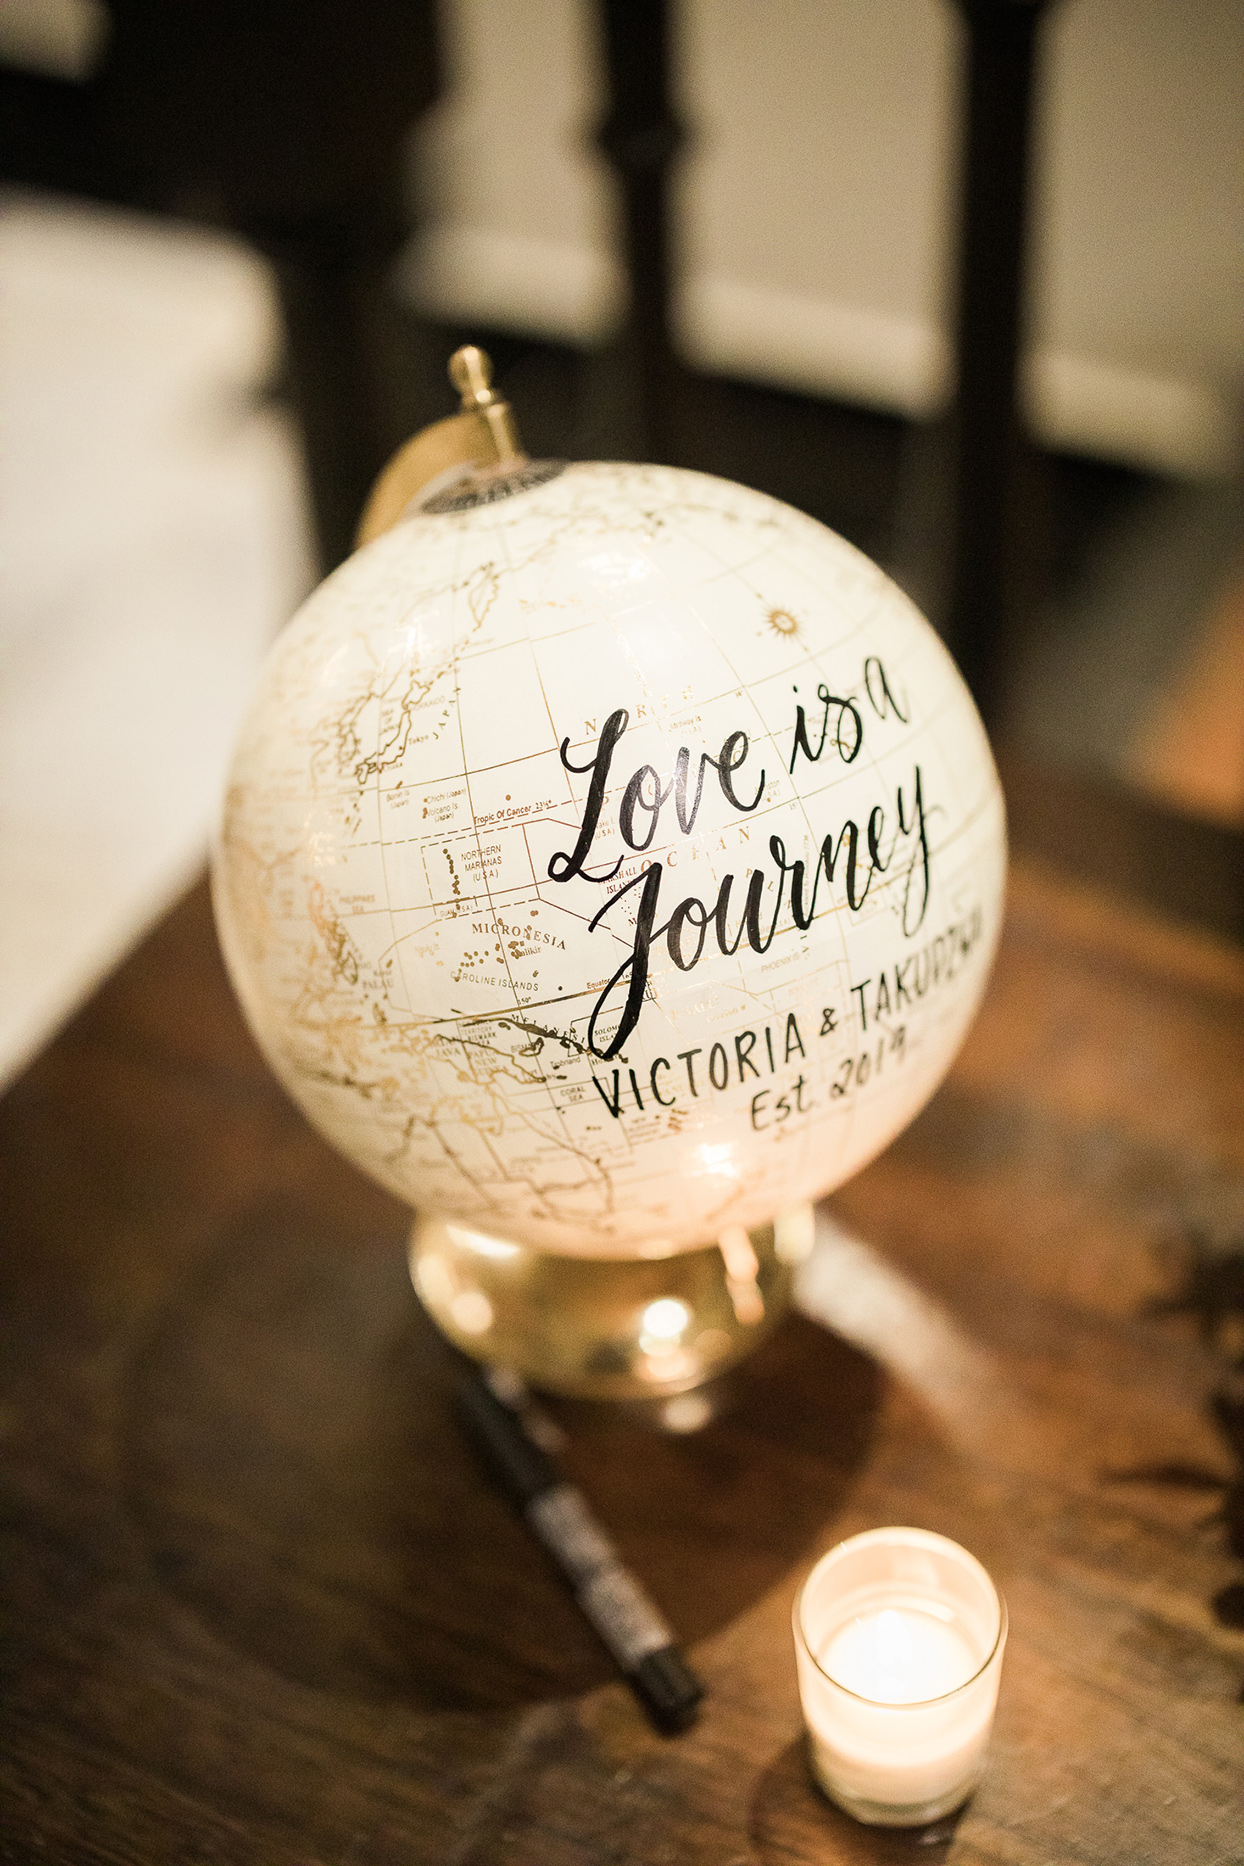 victoria tk wedding guest book globe